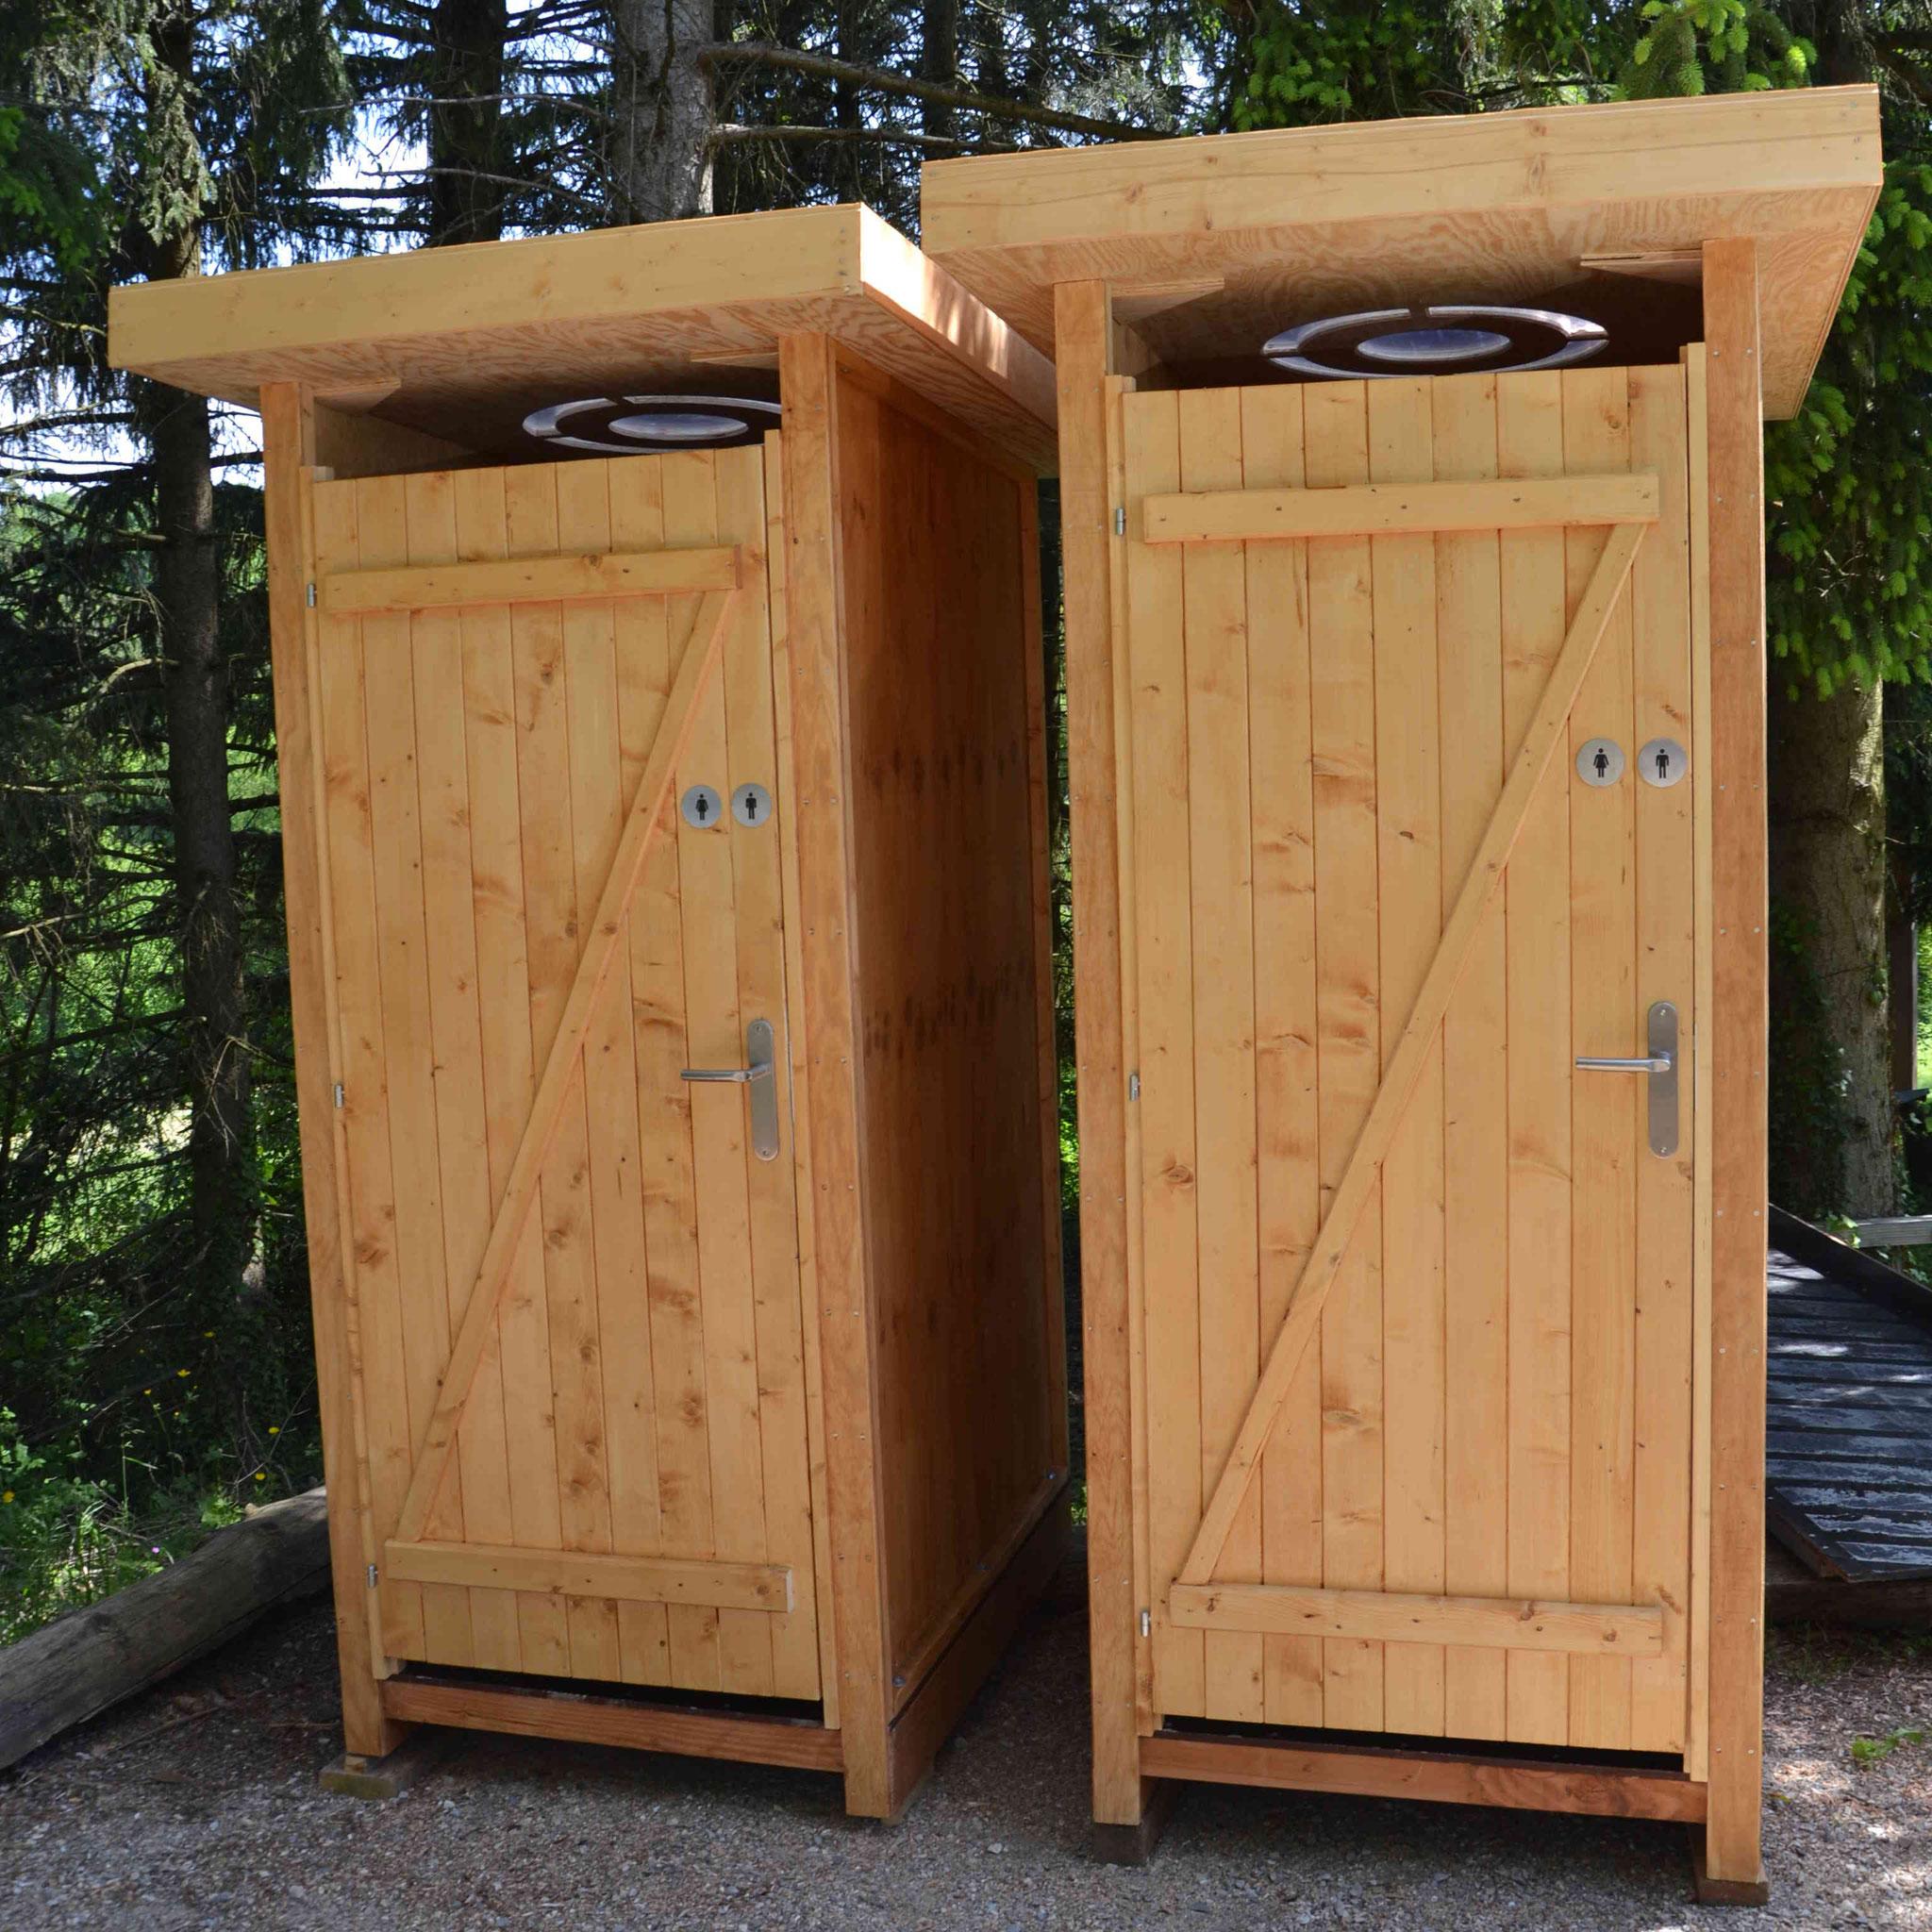 location toilettes seches rh ne alpes airbois location de toilettes s ches. Black Bedroom Furniture Sets. Home Design Ideas